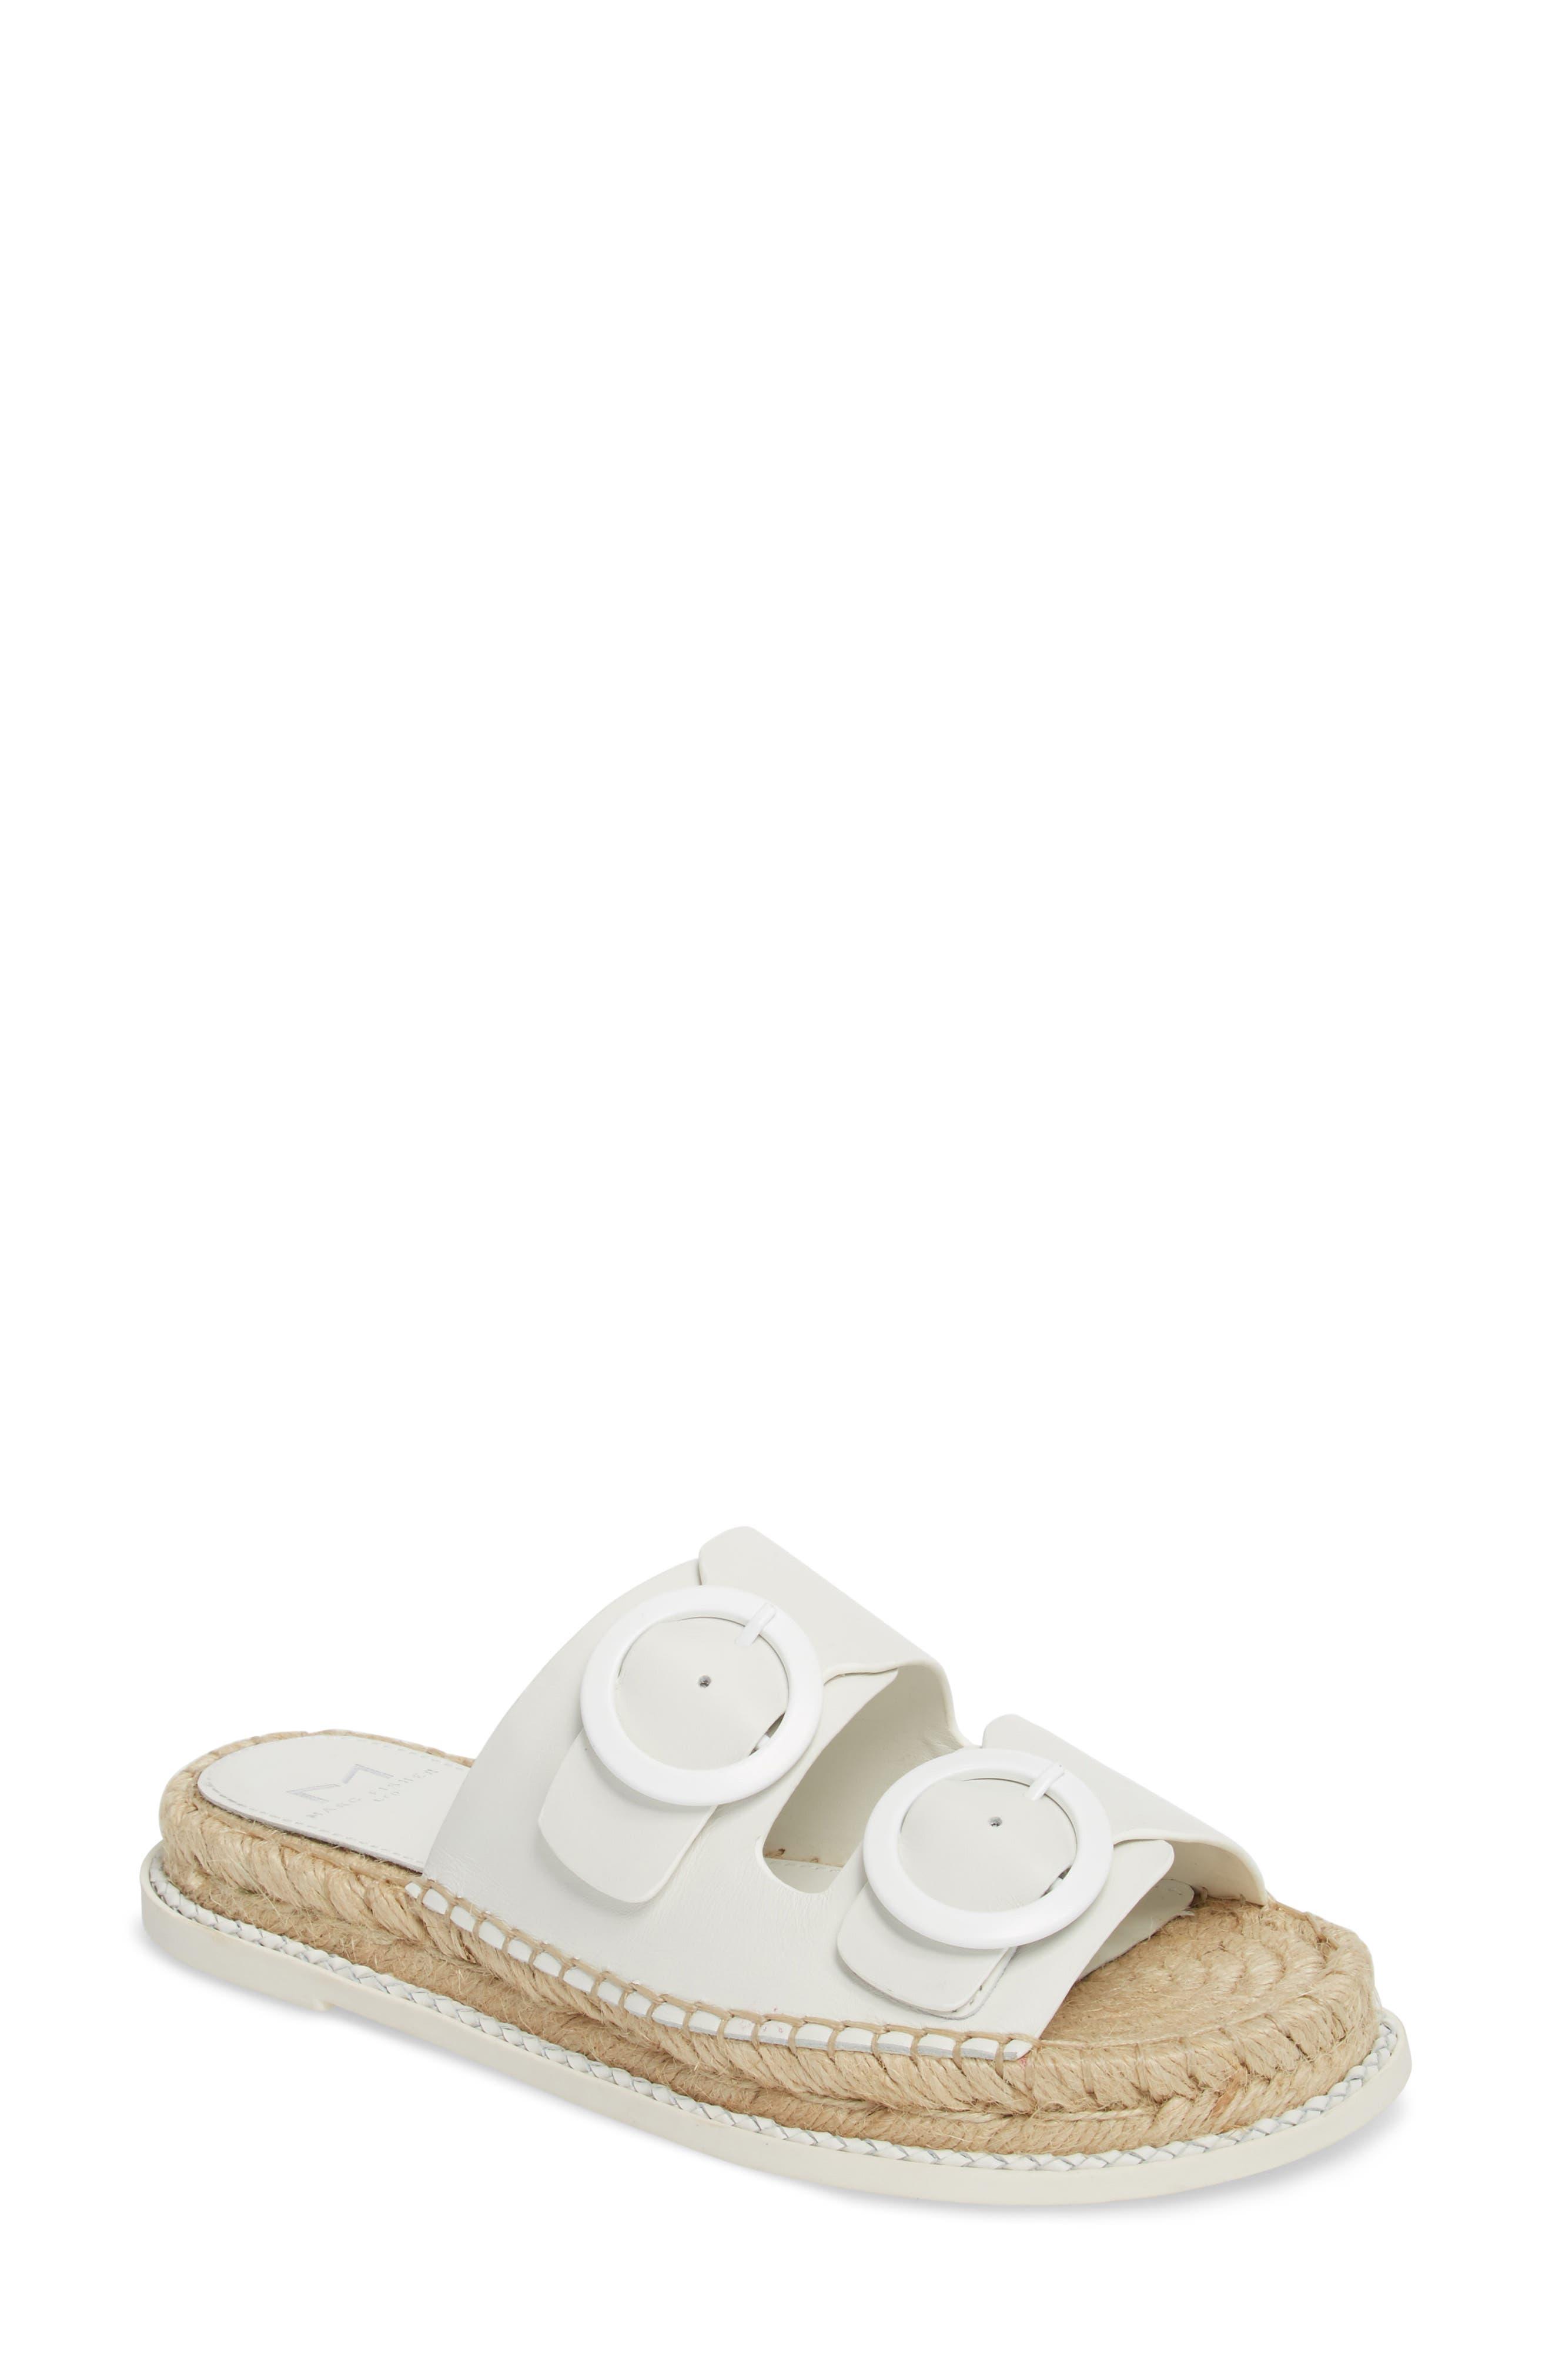 Ramba Espadrille Slide Sandal,                         Main,                         color, White Leather